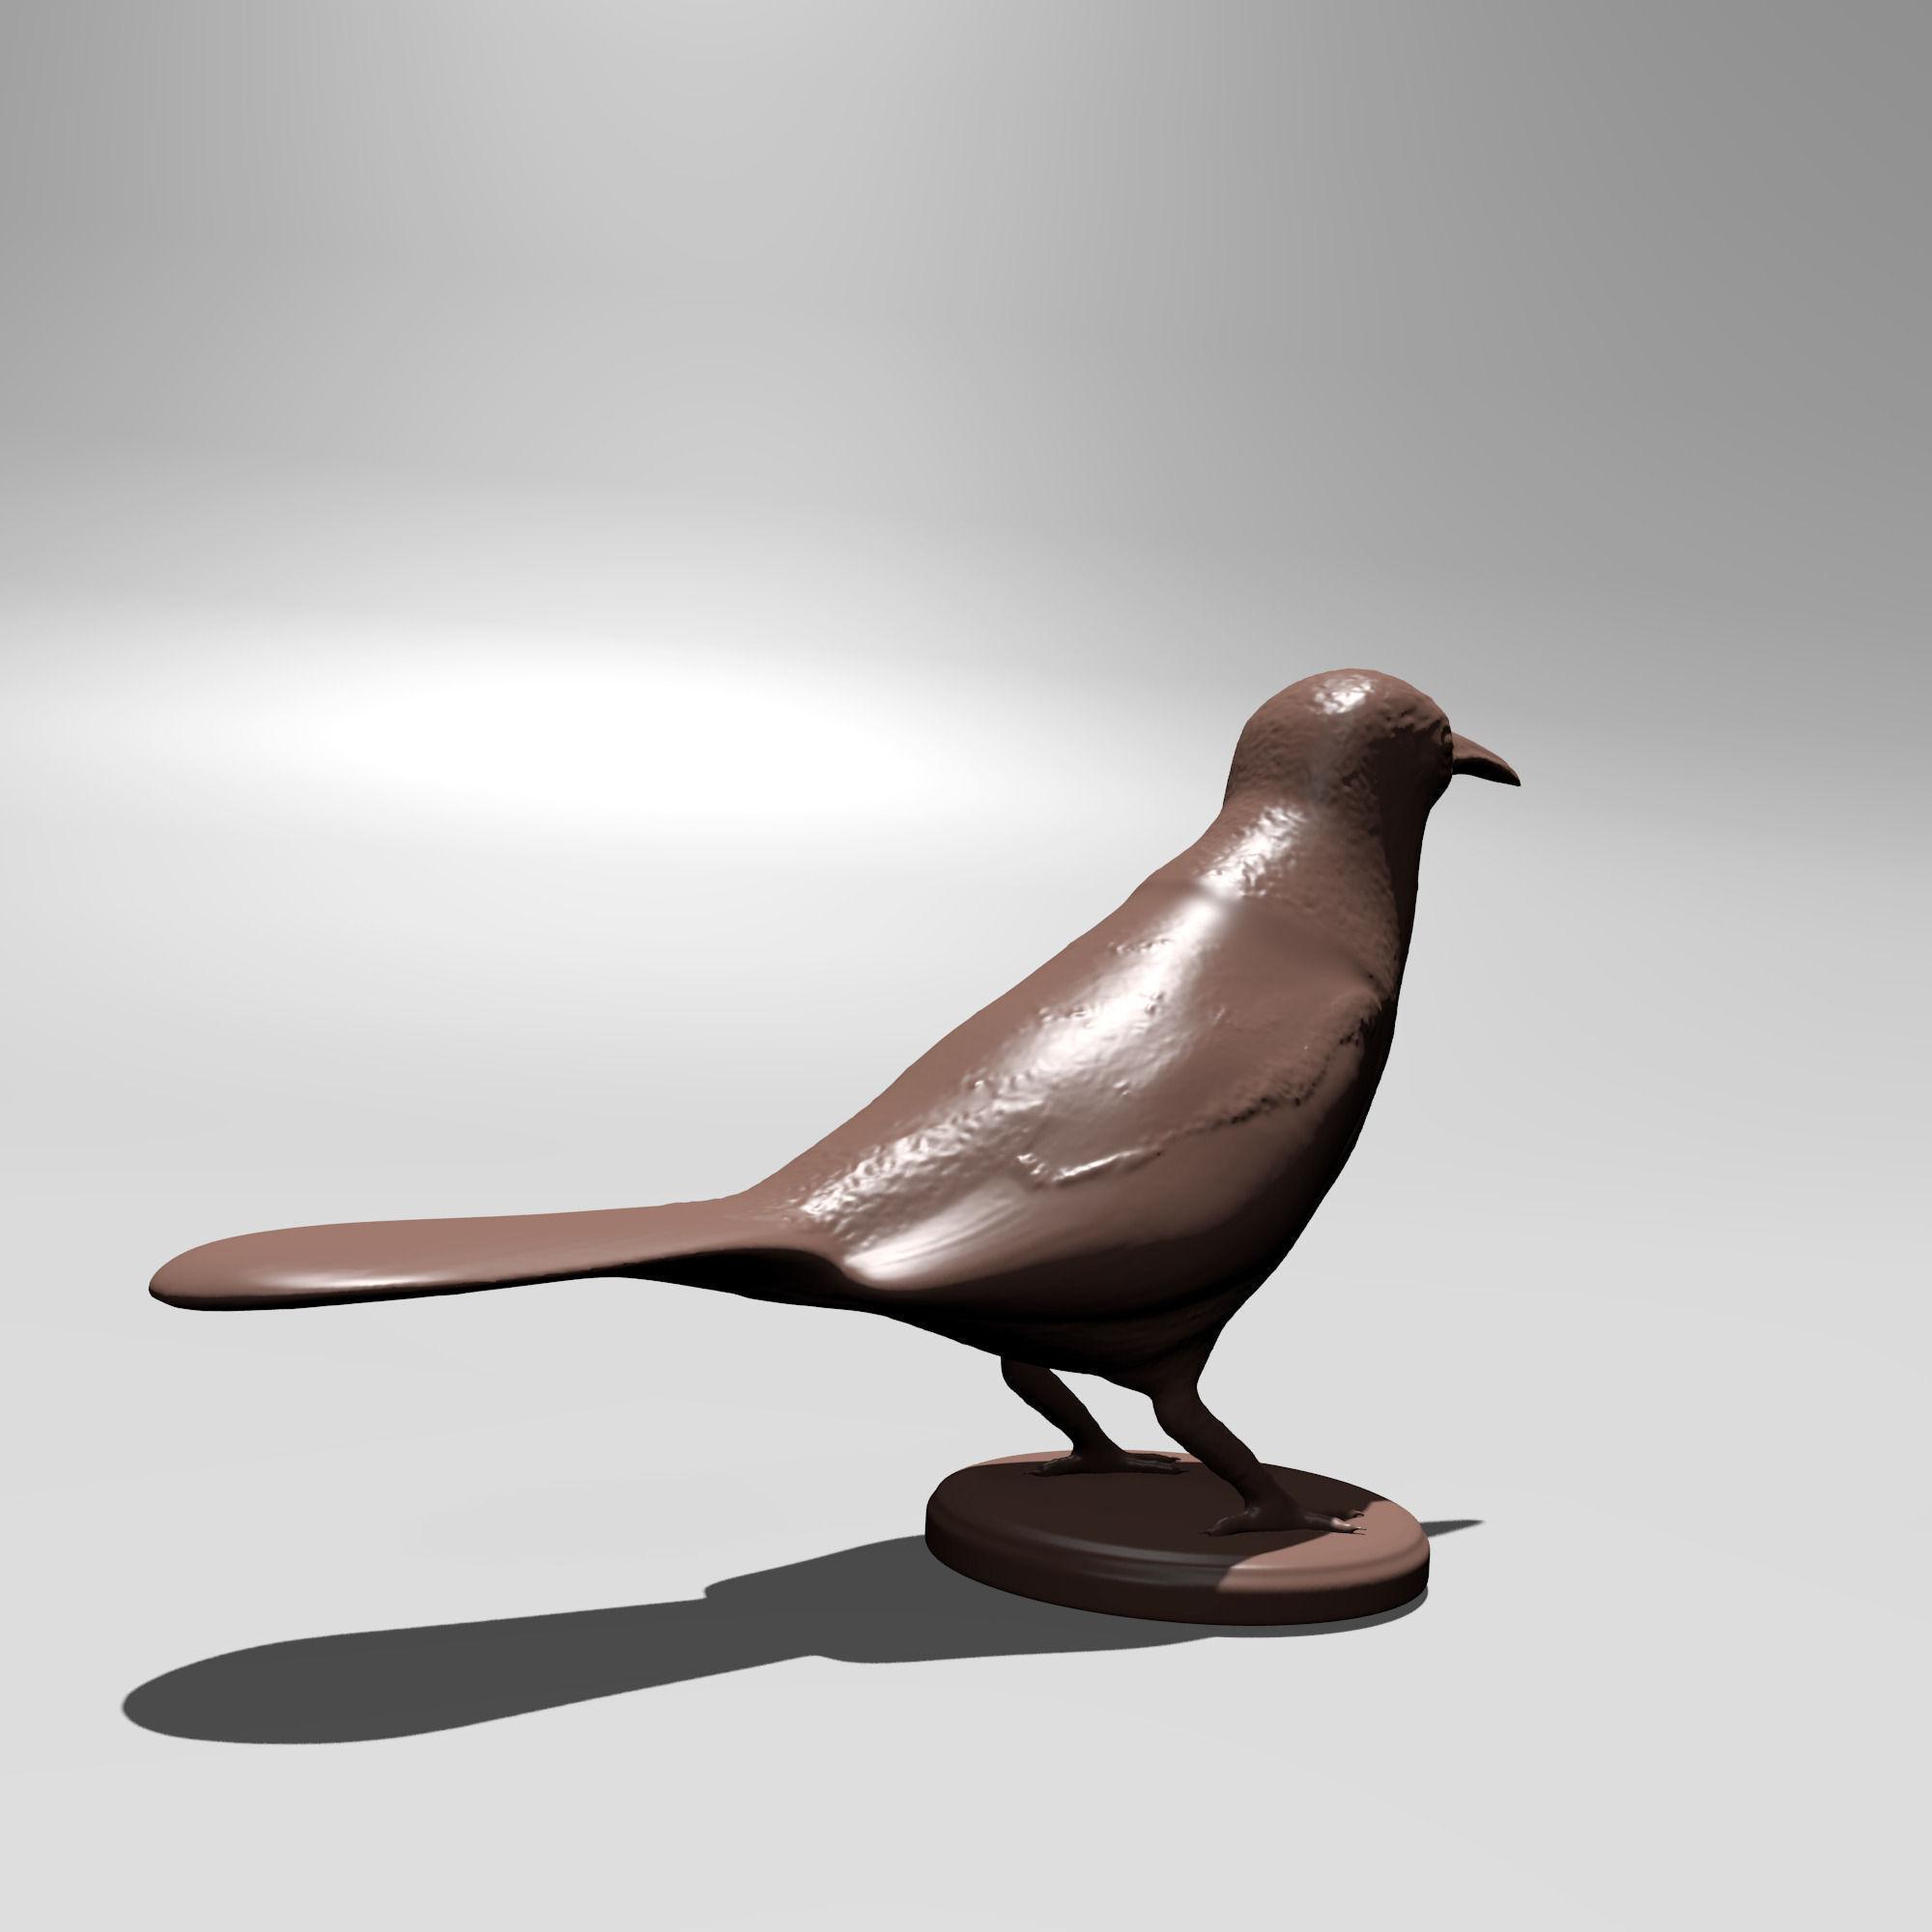 3d Printable Bird 3D Model 3D Printable .stl